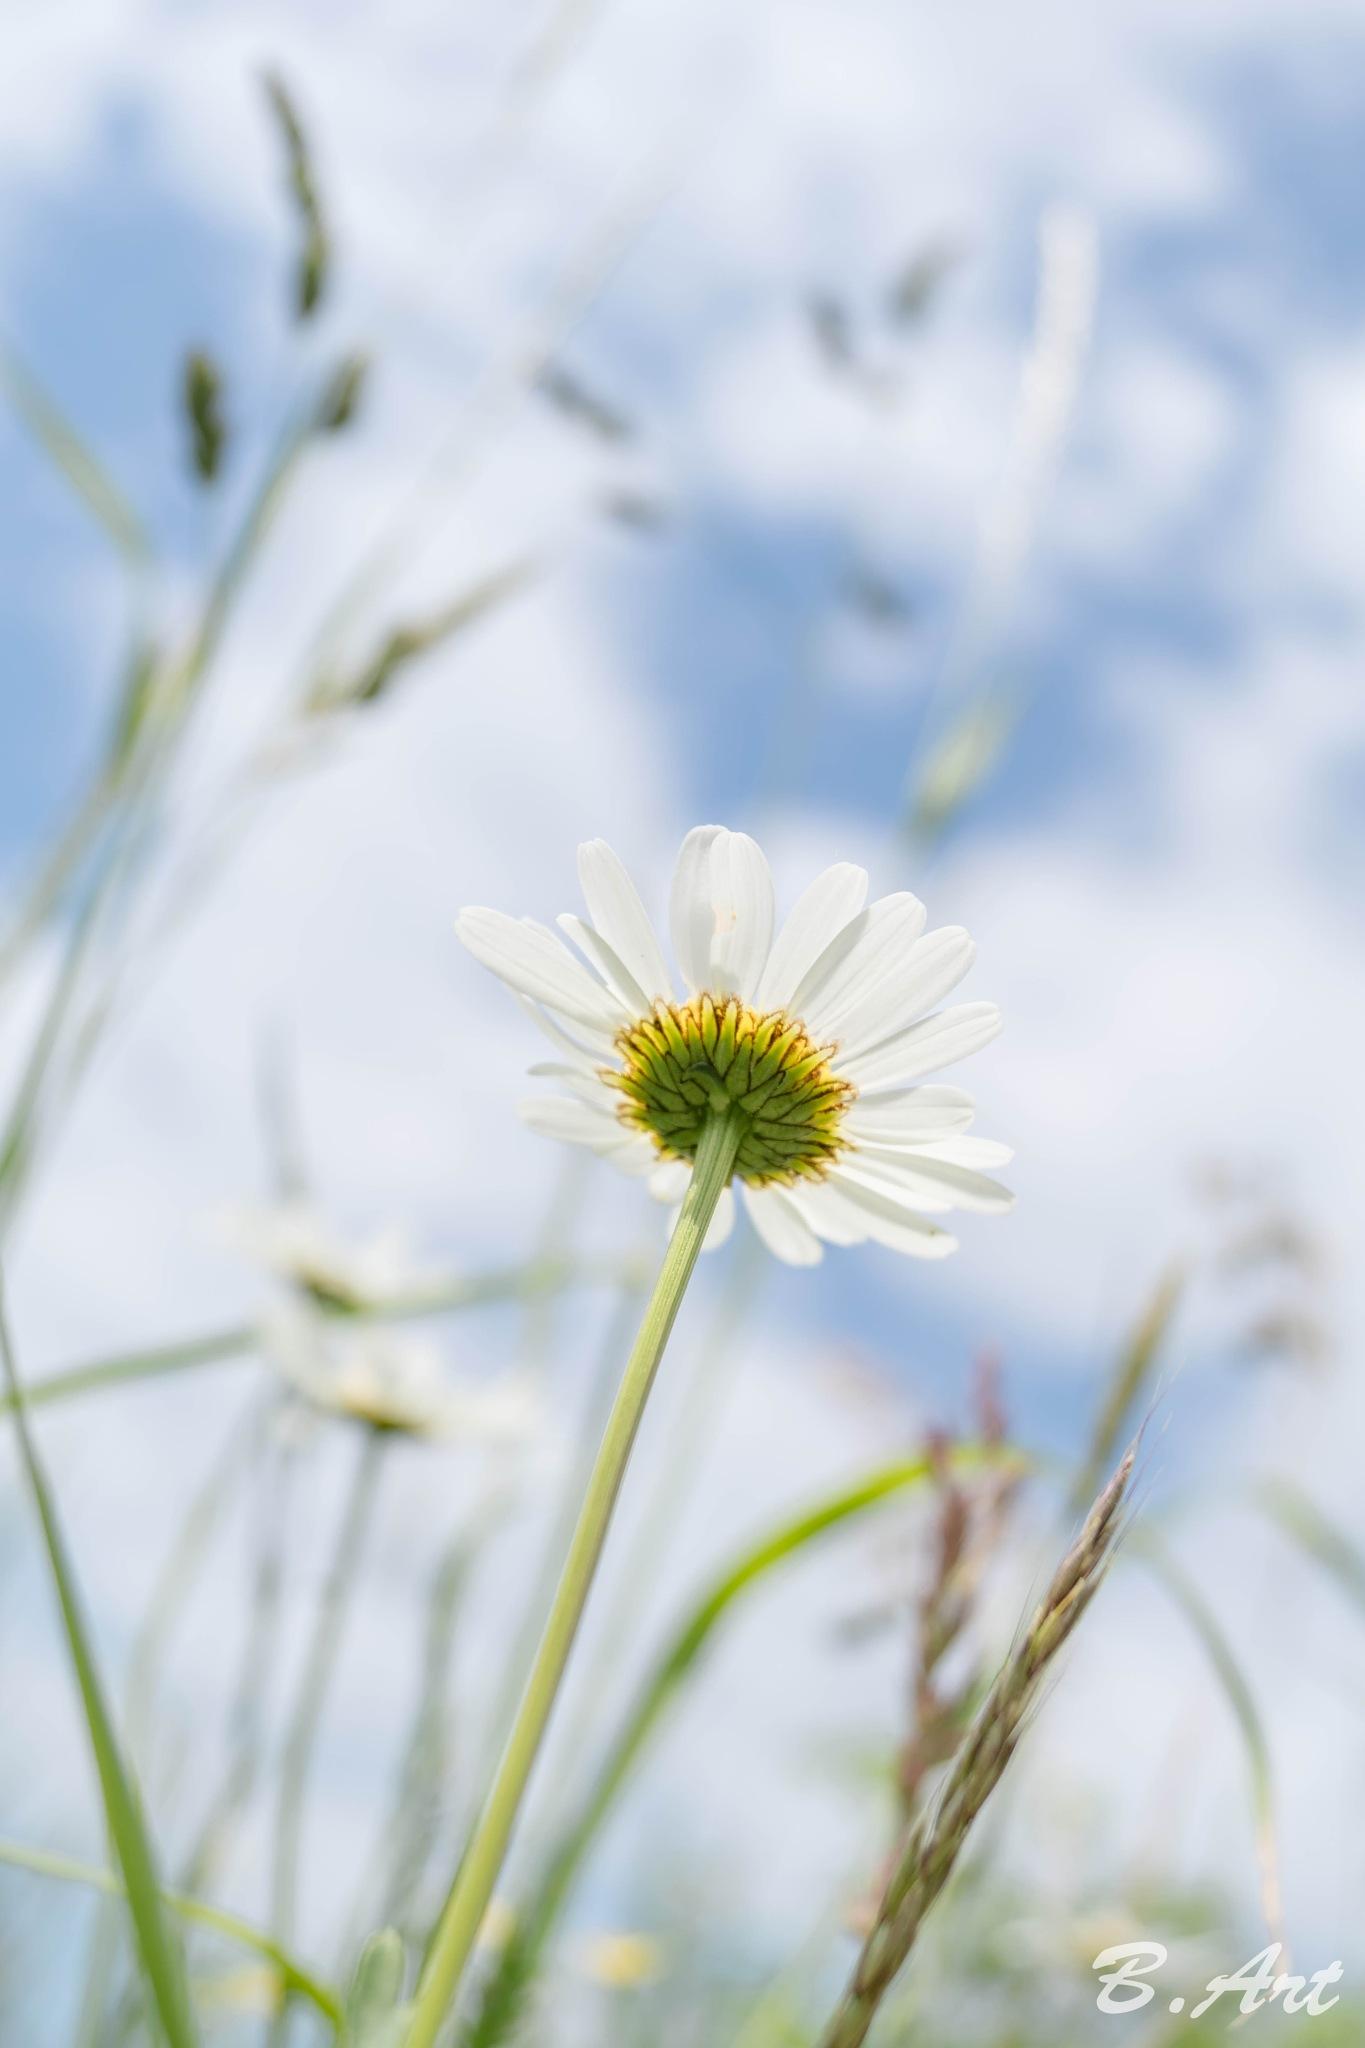 daisy... by Bart van Reeth